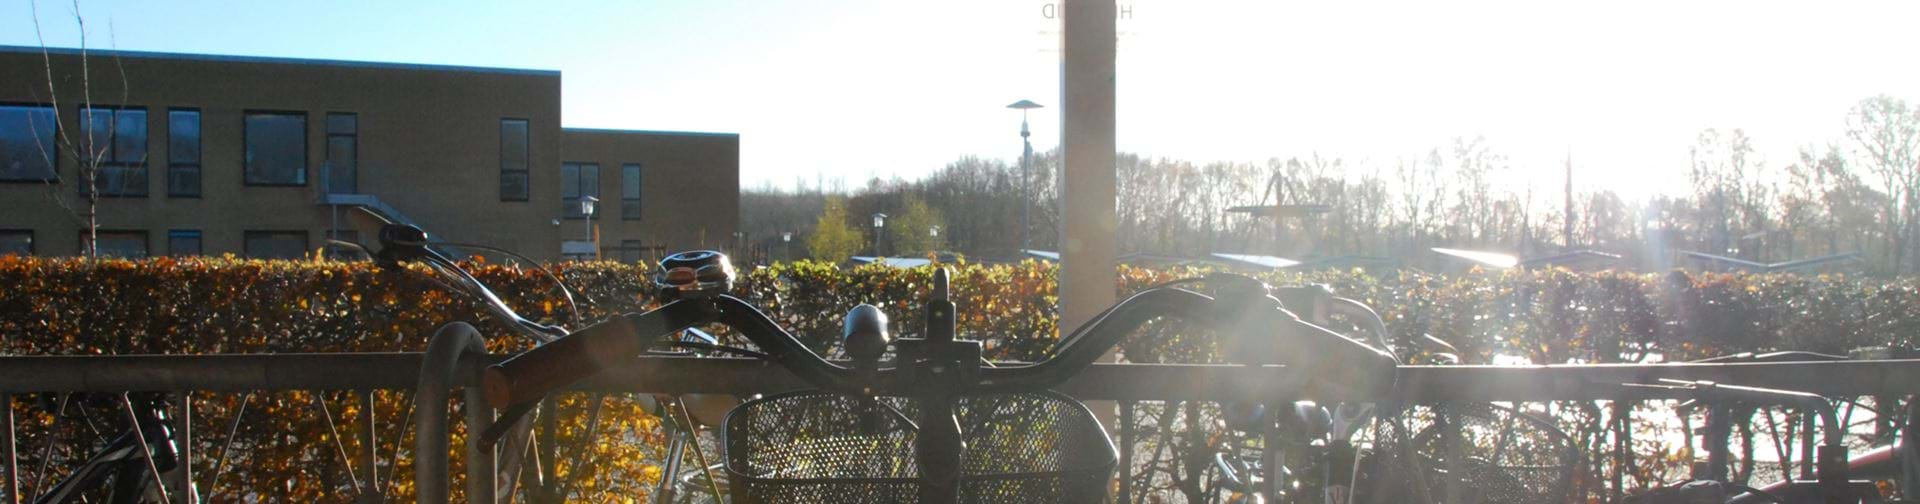 Cykelstyr i cykelskur